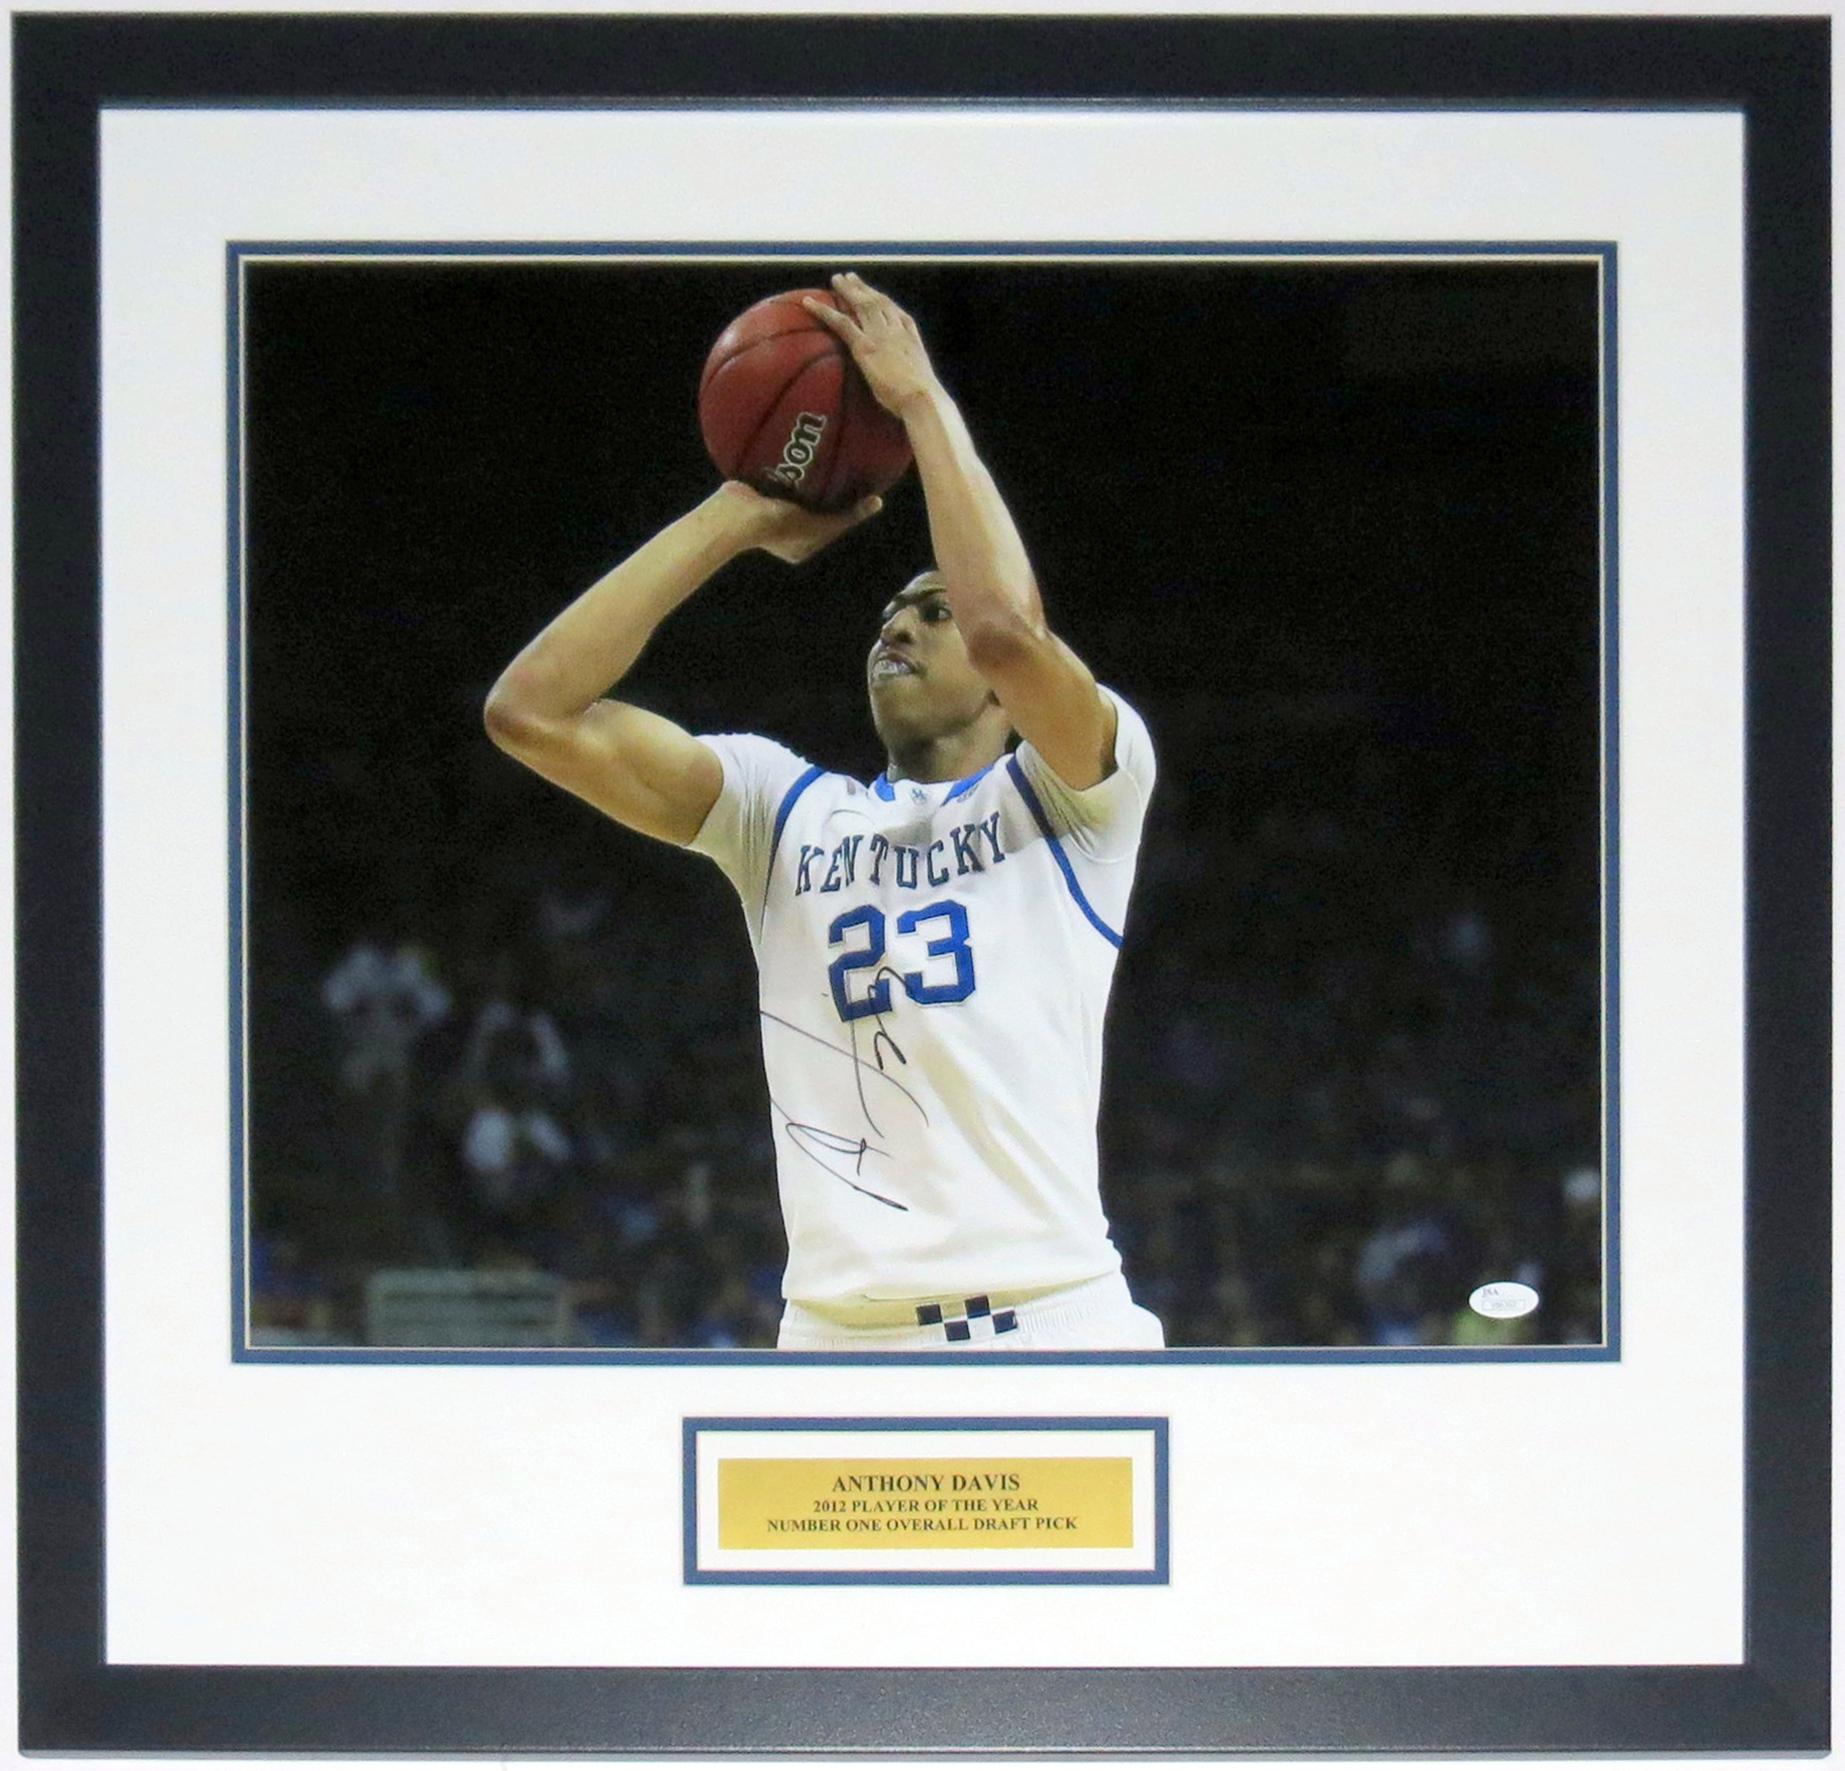 Anthony Davis Kentucky Wildcats Autographed 16x20 Photo - JSA COA Authenticated - Professionally Framed & Plate